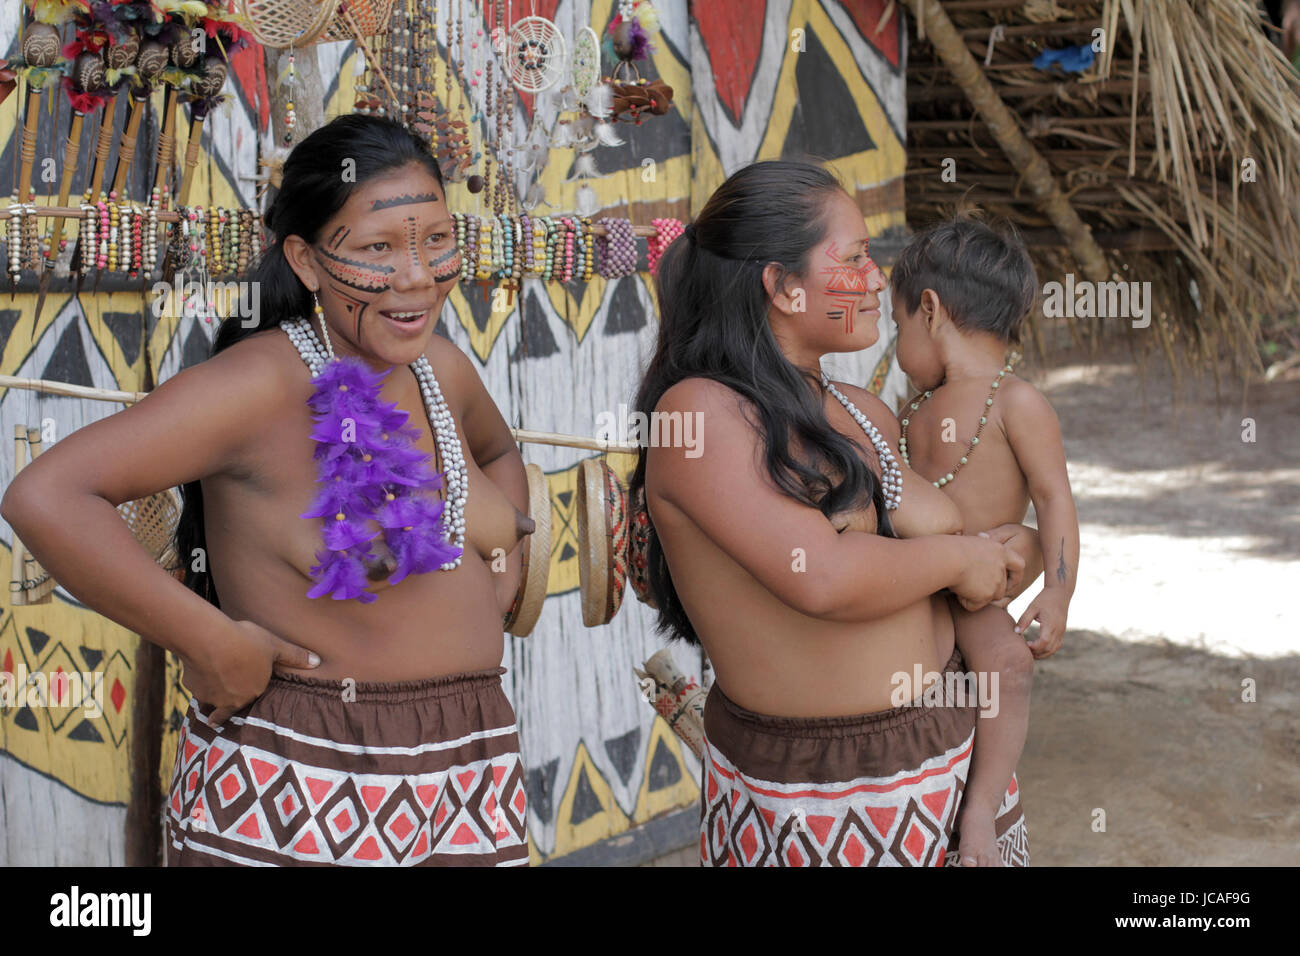 Manaus brazil women